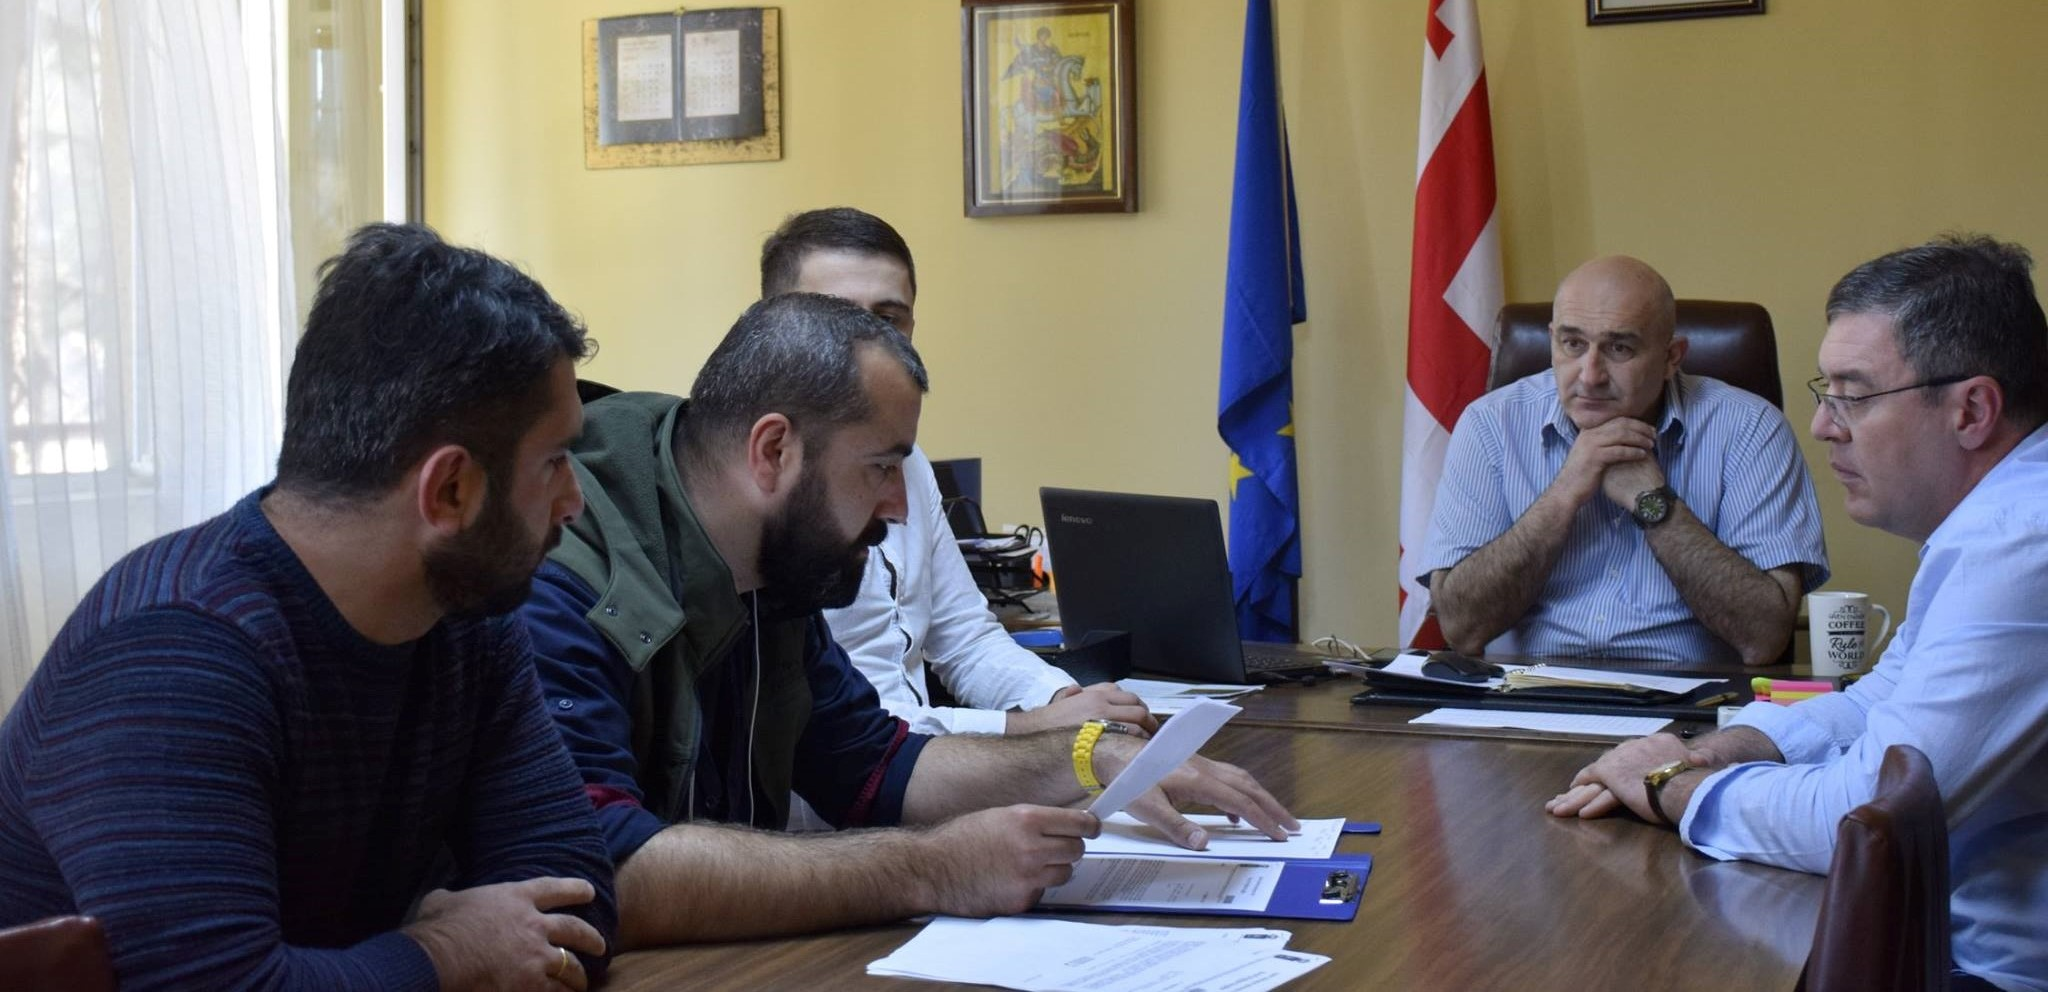 http://new.admin.kharagauli.ge/images/Nphoto/ghjghjhjkhjk_1.jpg